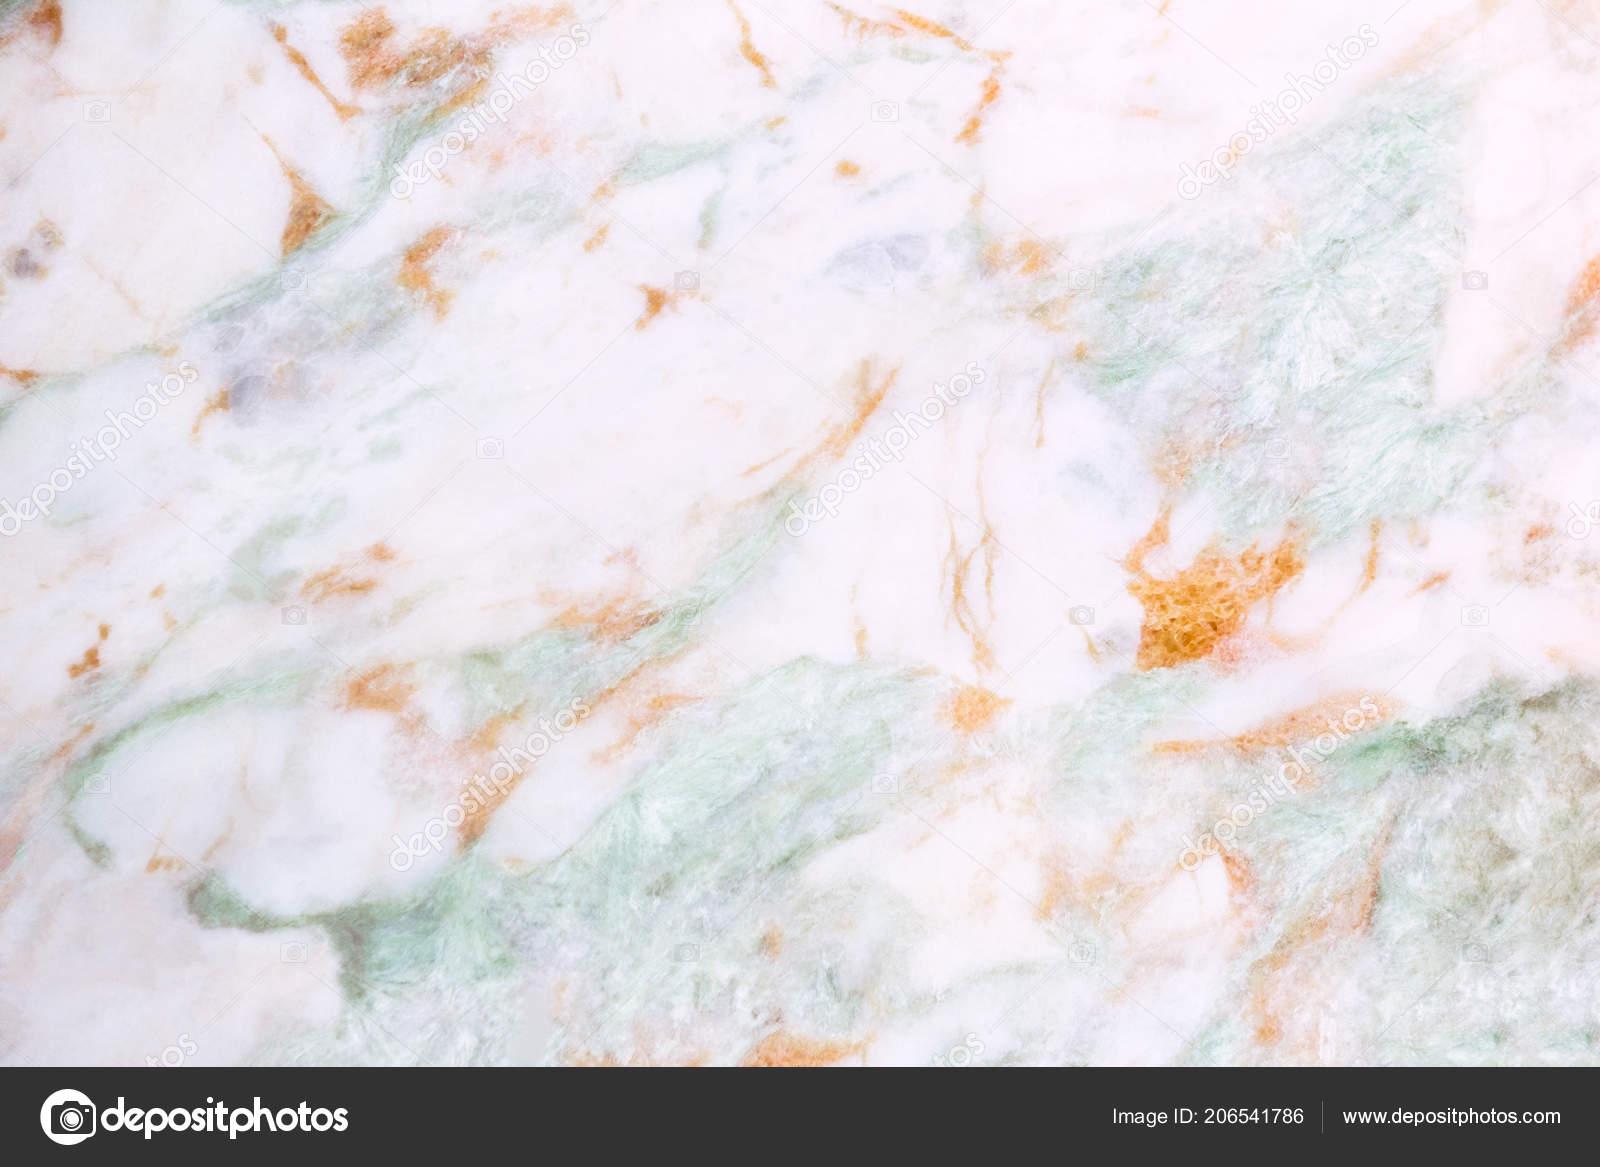 Marmo Bianco Astratto Rosa Bianca Misti Sfondo Pattern Texture